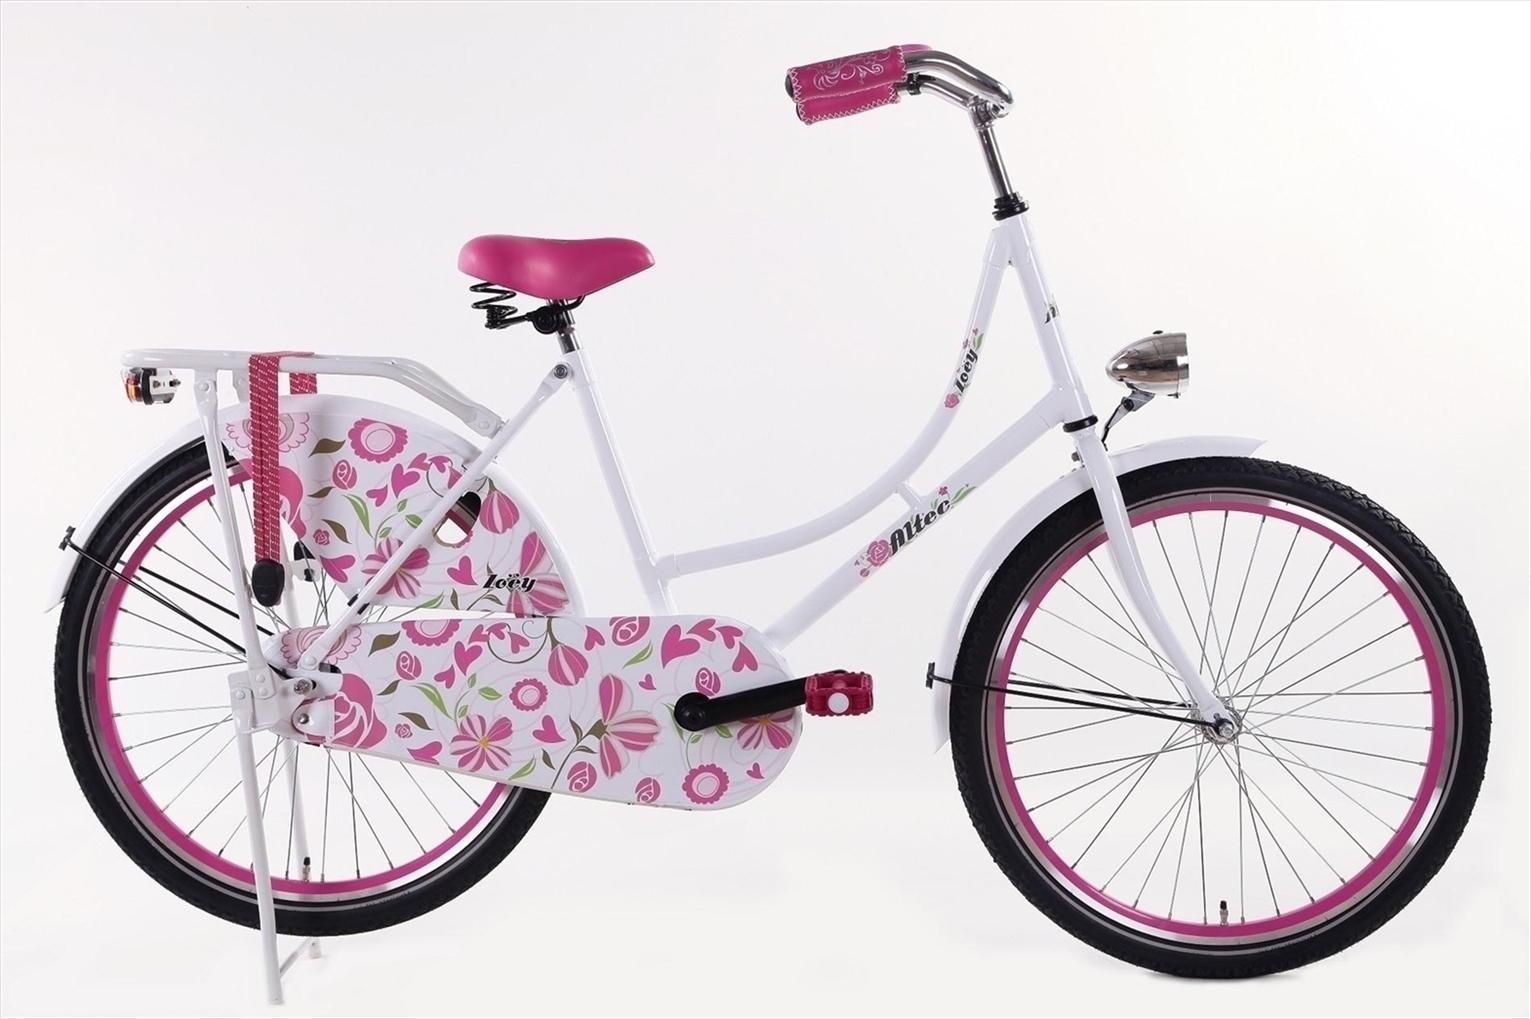 26 zoll hollandrad zoey wei rosa d fahrrad ass. Black Bedroom Furniture Sets. Home Design Ideas